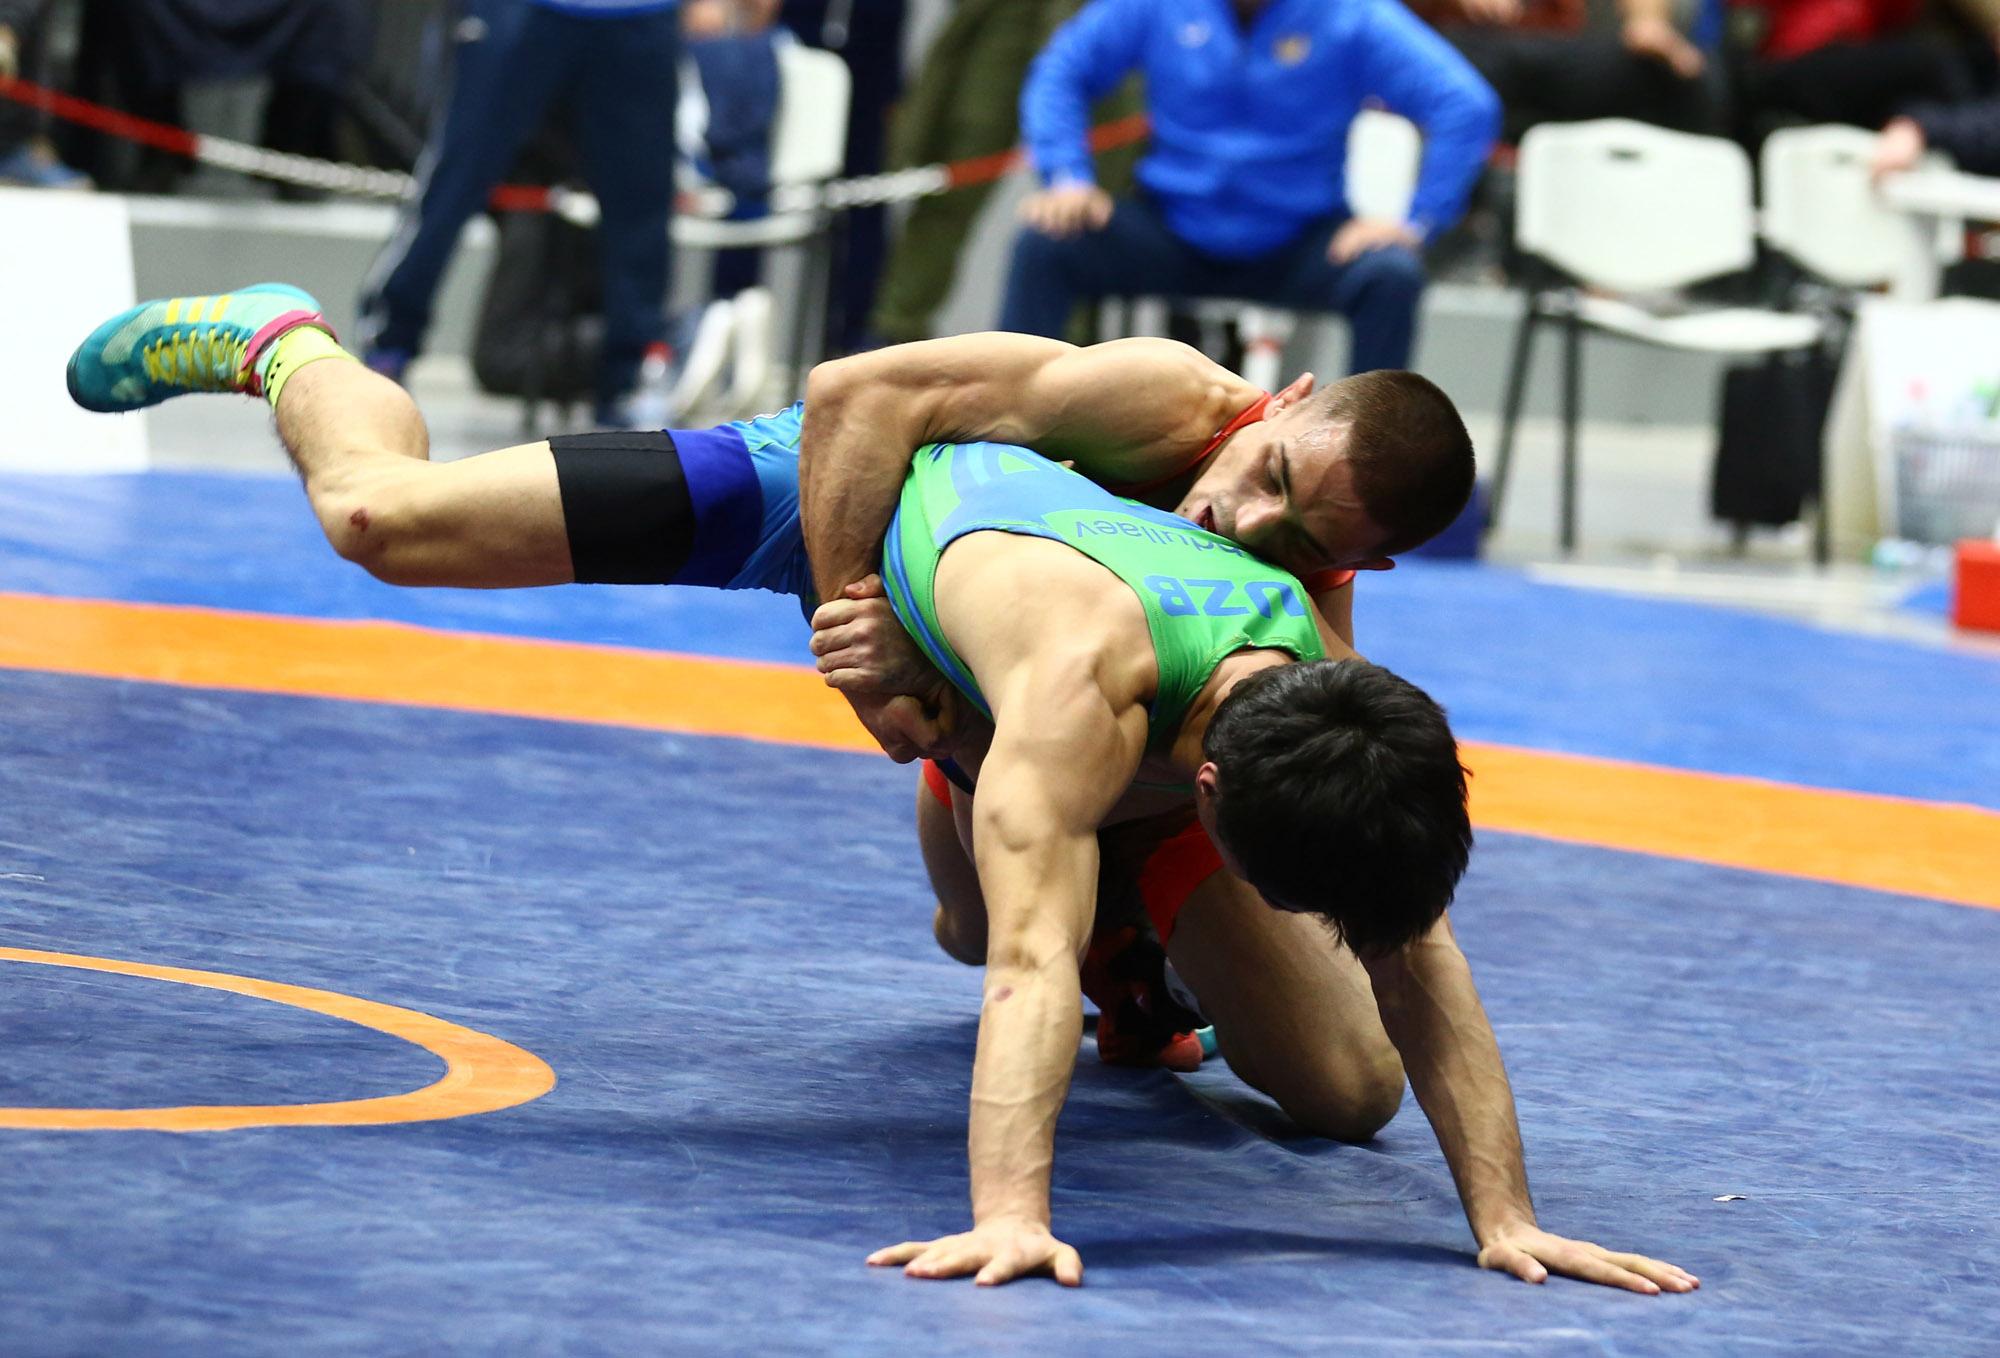 Георги Ванелов загуби битката за бронзовия медал